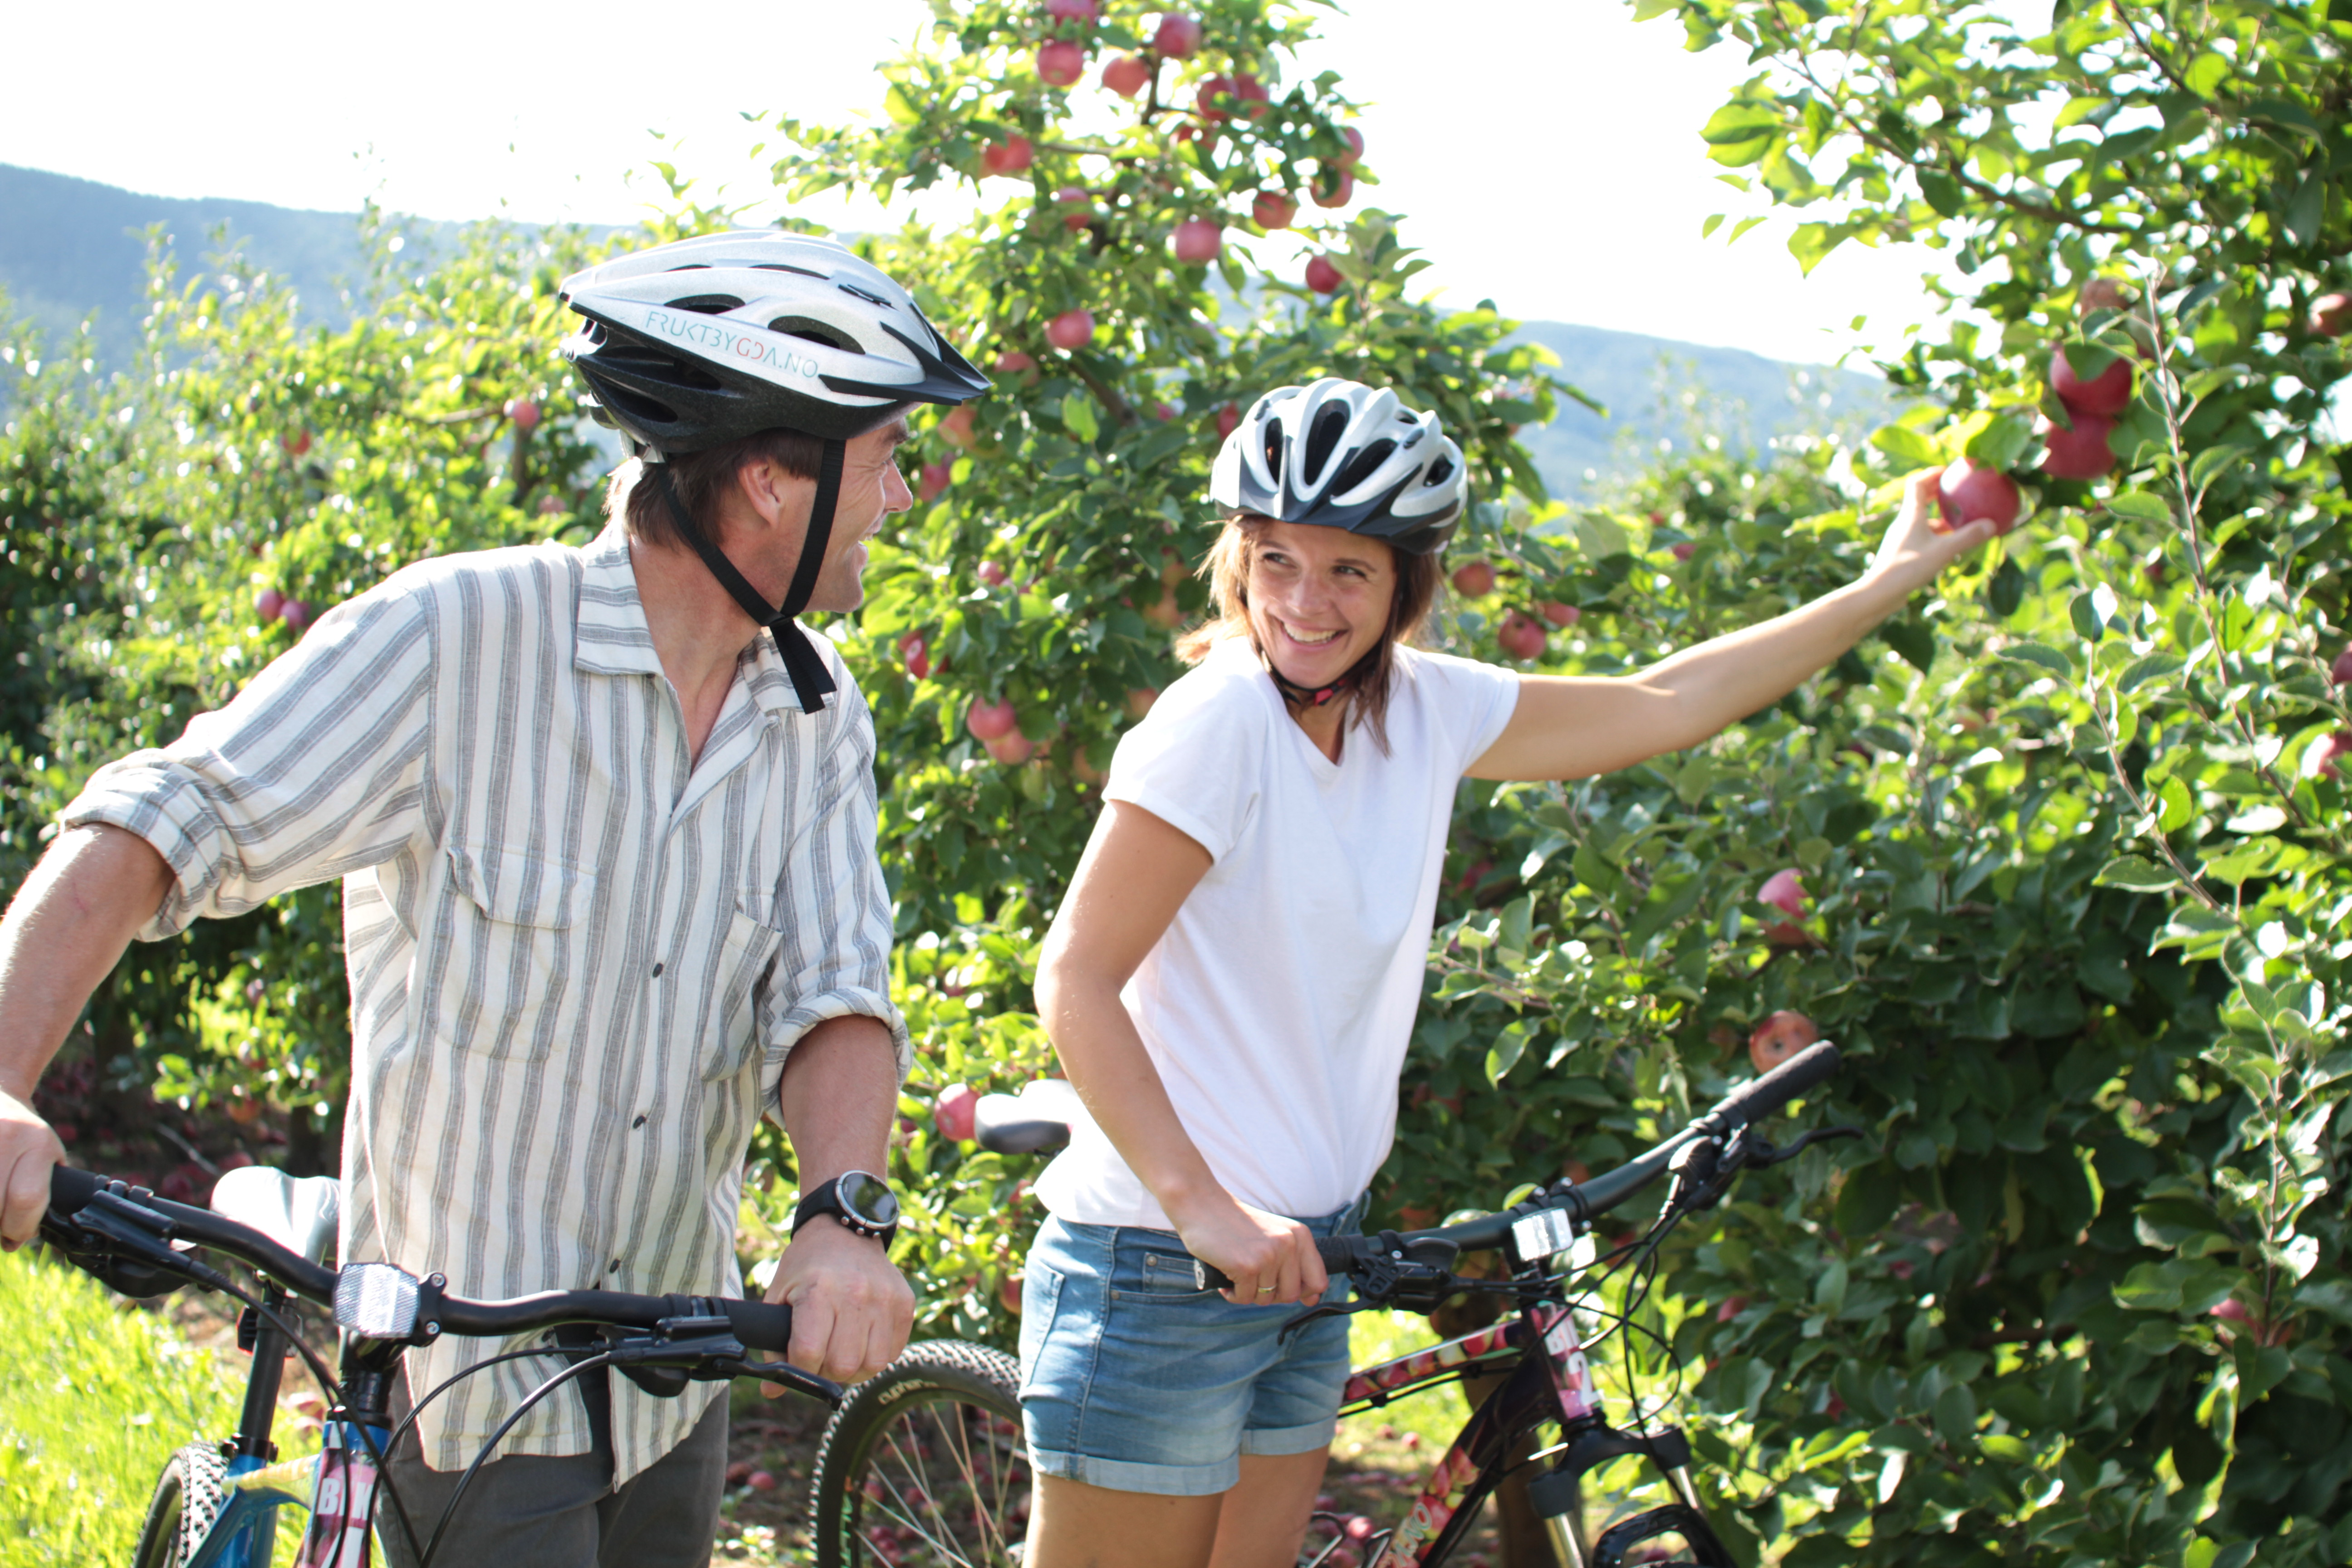 På sykkeltur i Fruktbygda